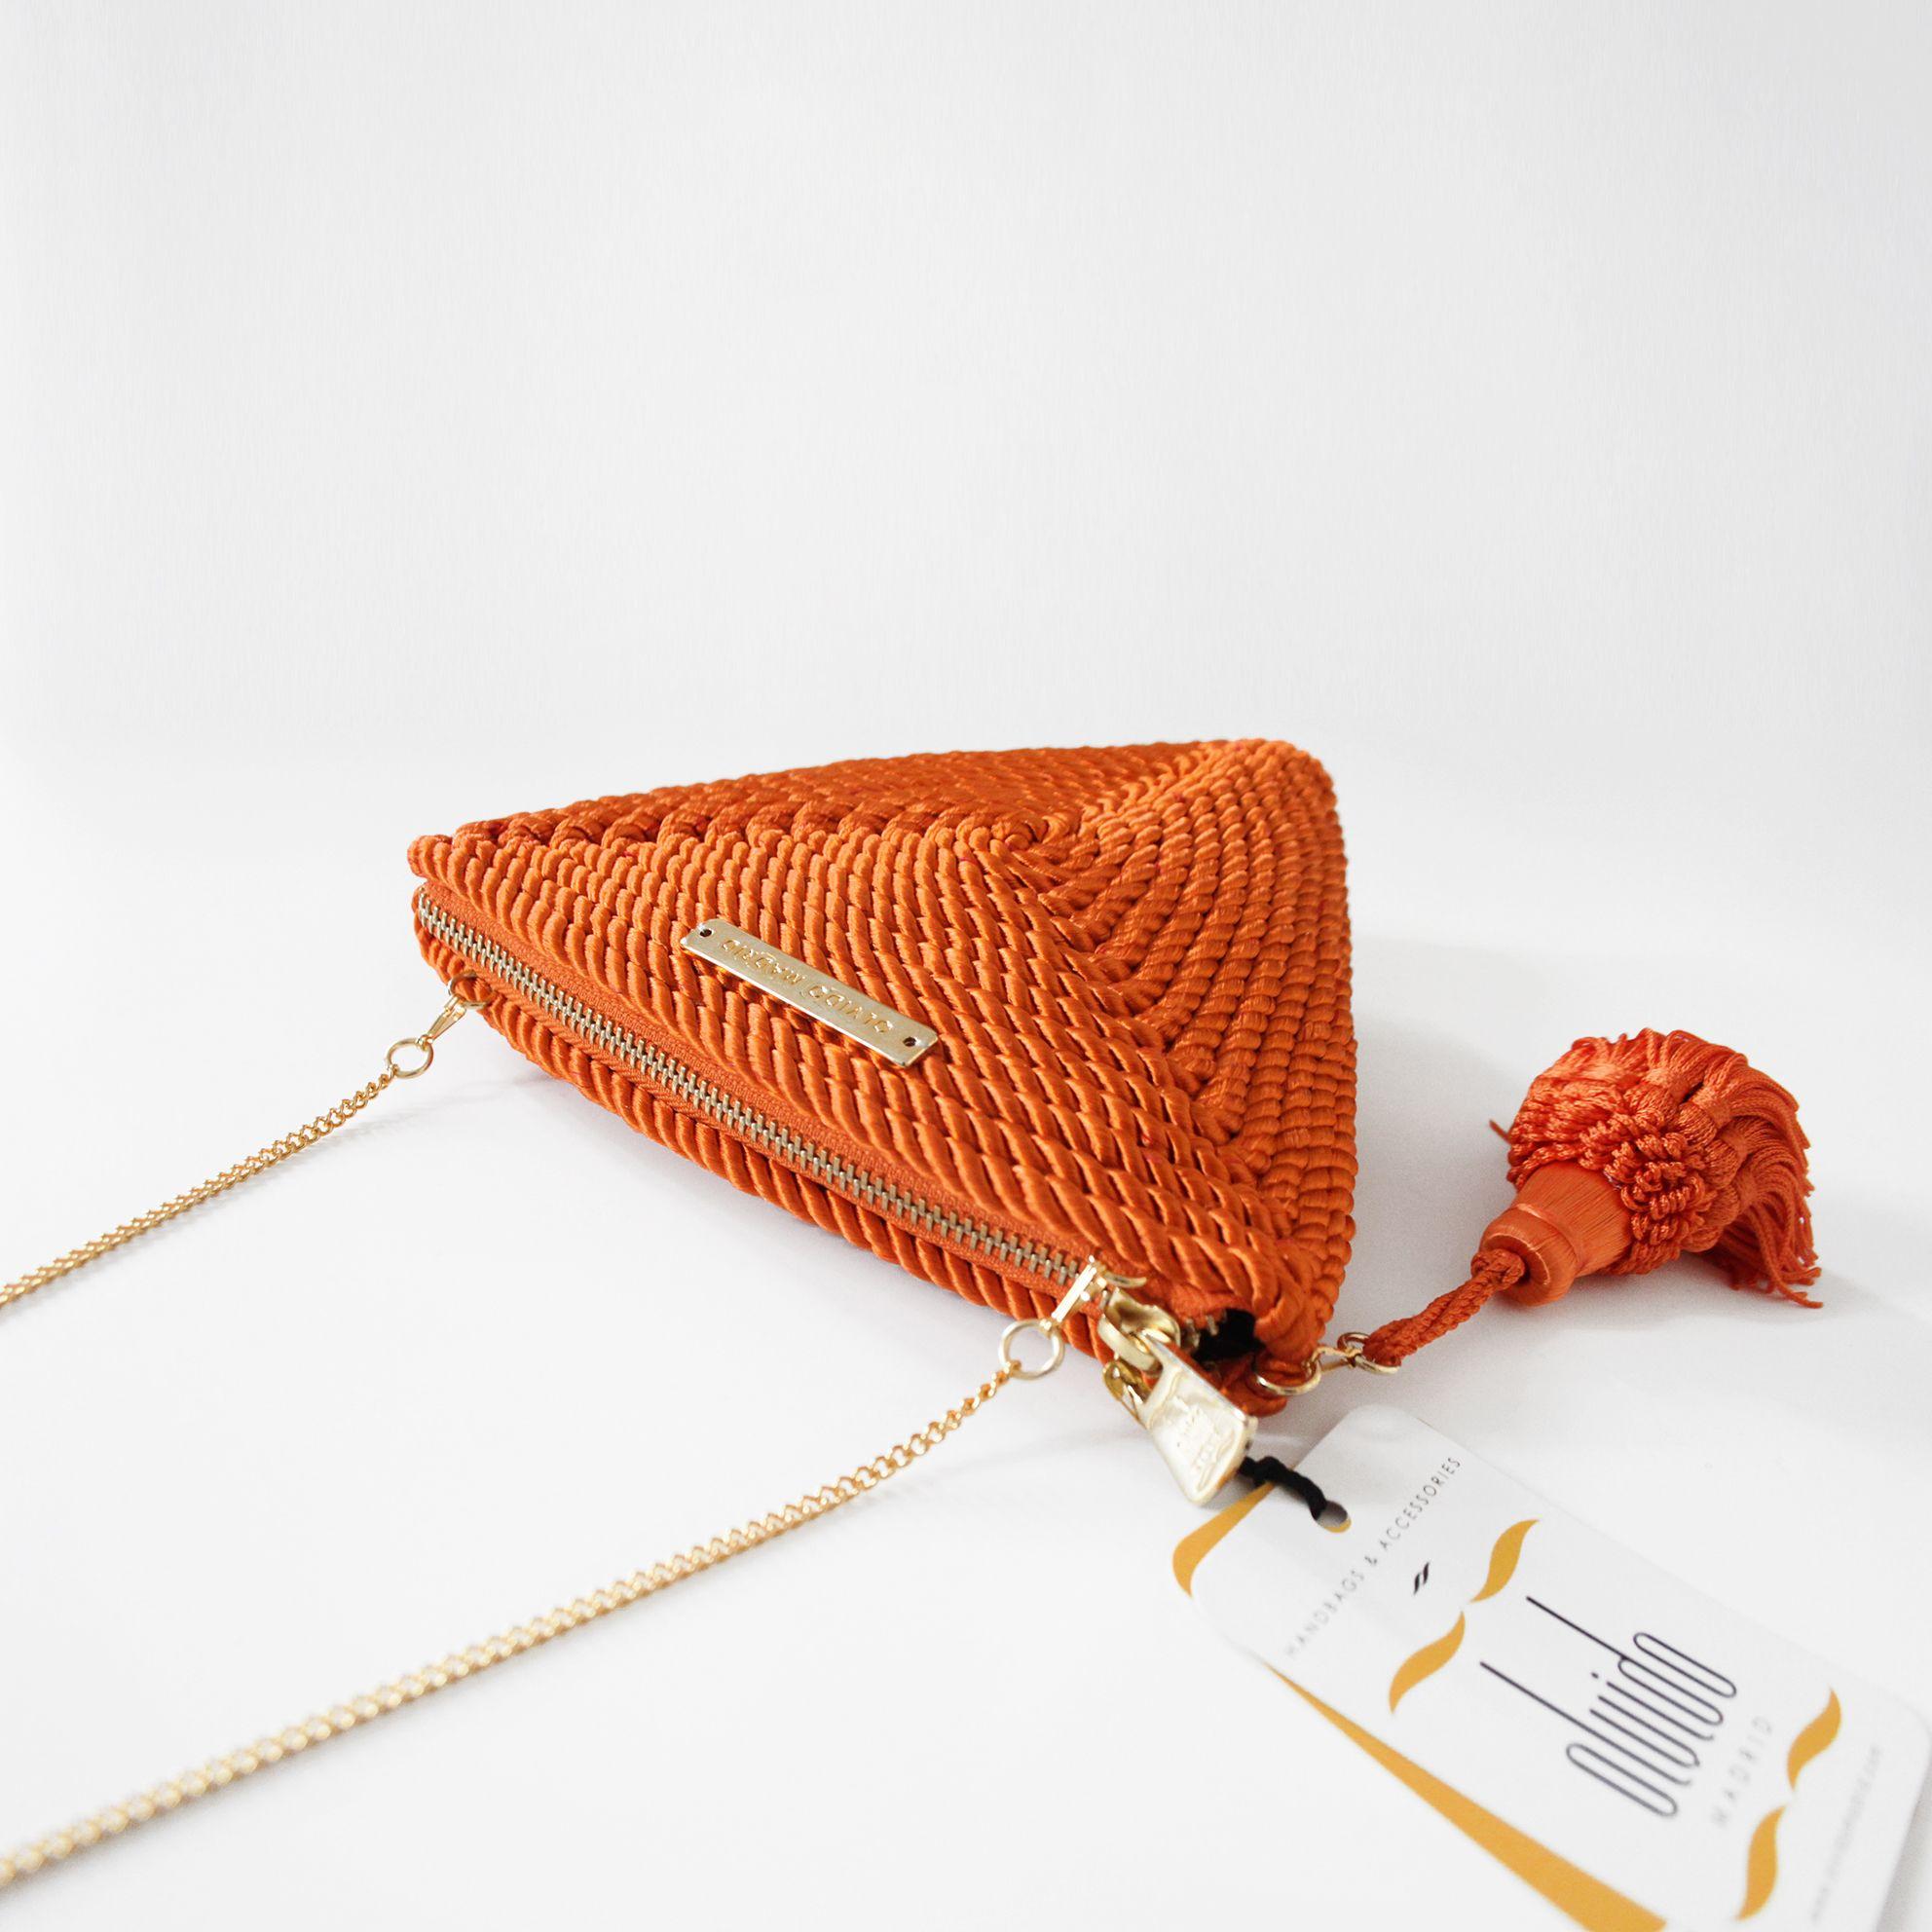 1a1291d96 ○ Bolso de fiesta hecho en cordón de seda | Modelo Alejandra naranja |  Diseños OLVIDO MADRID | www.olvidomadrid.es